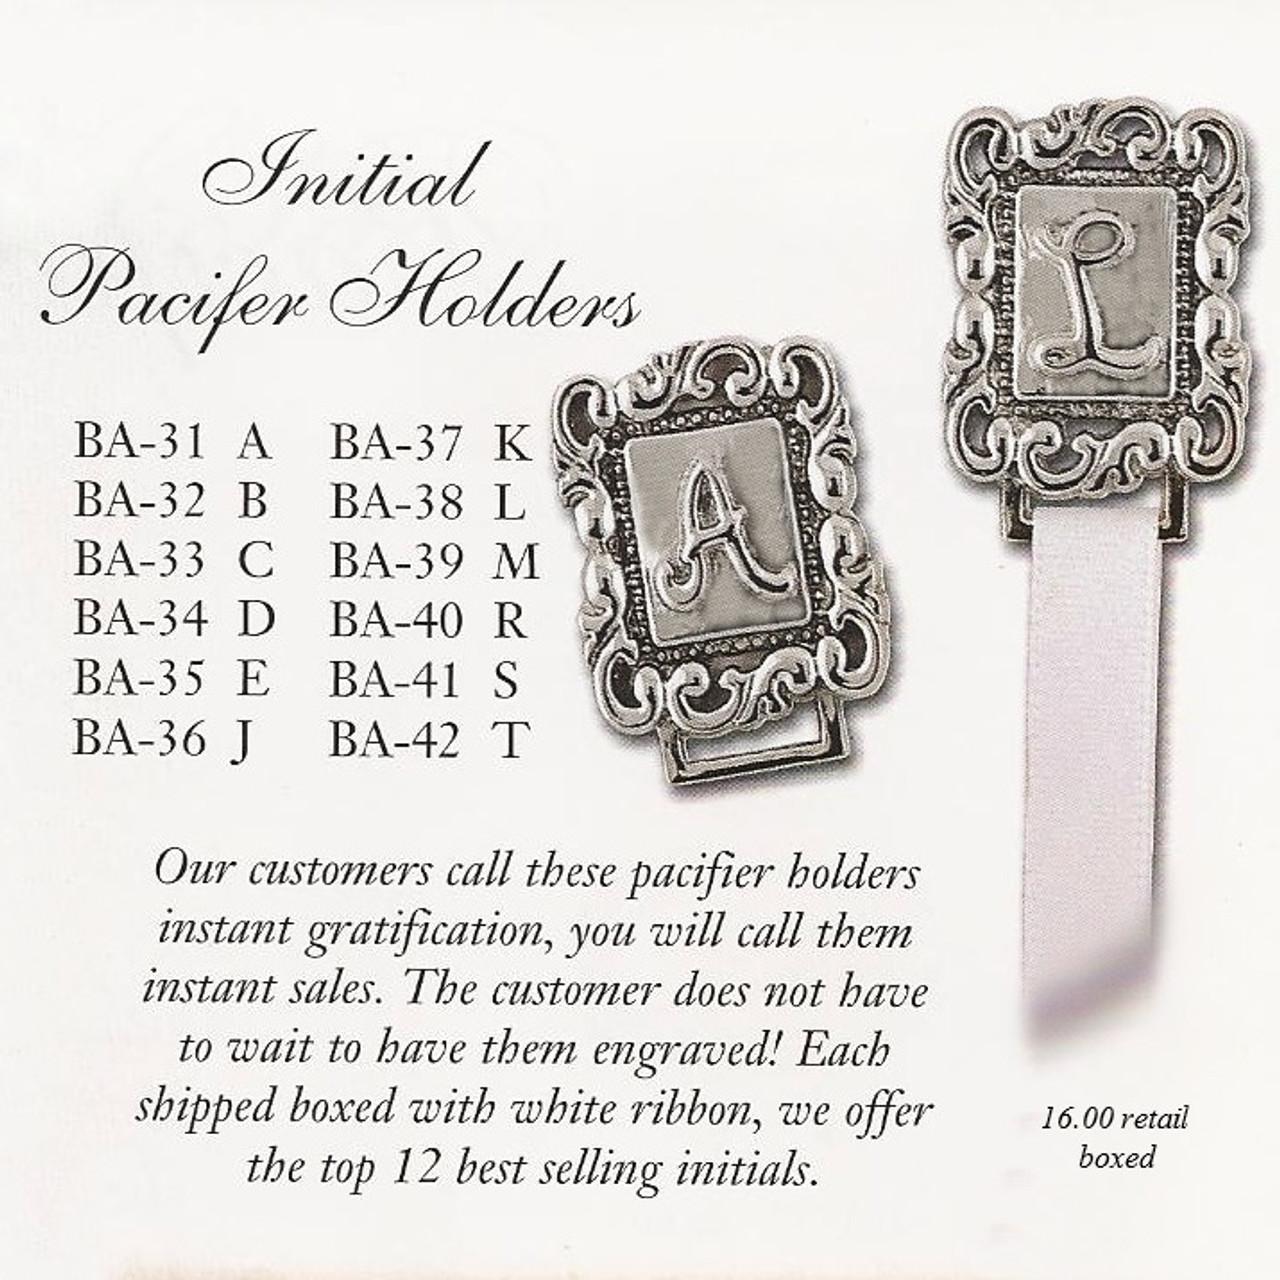 BA-31 Initial Paci Holders